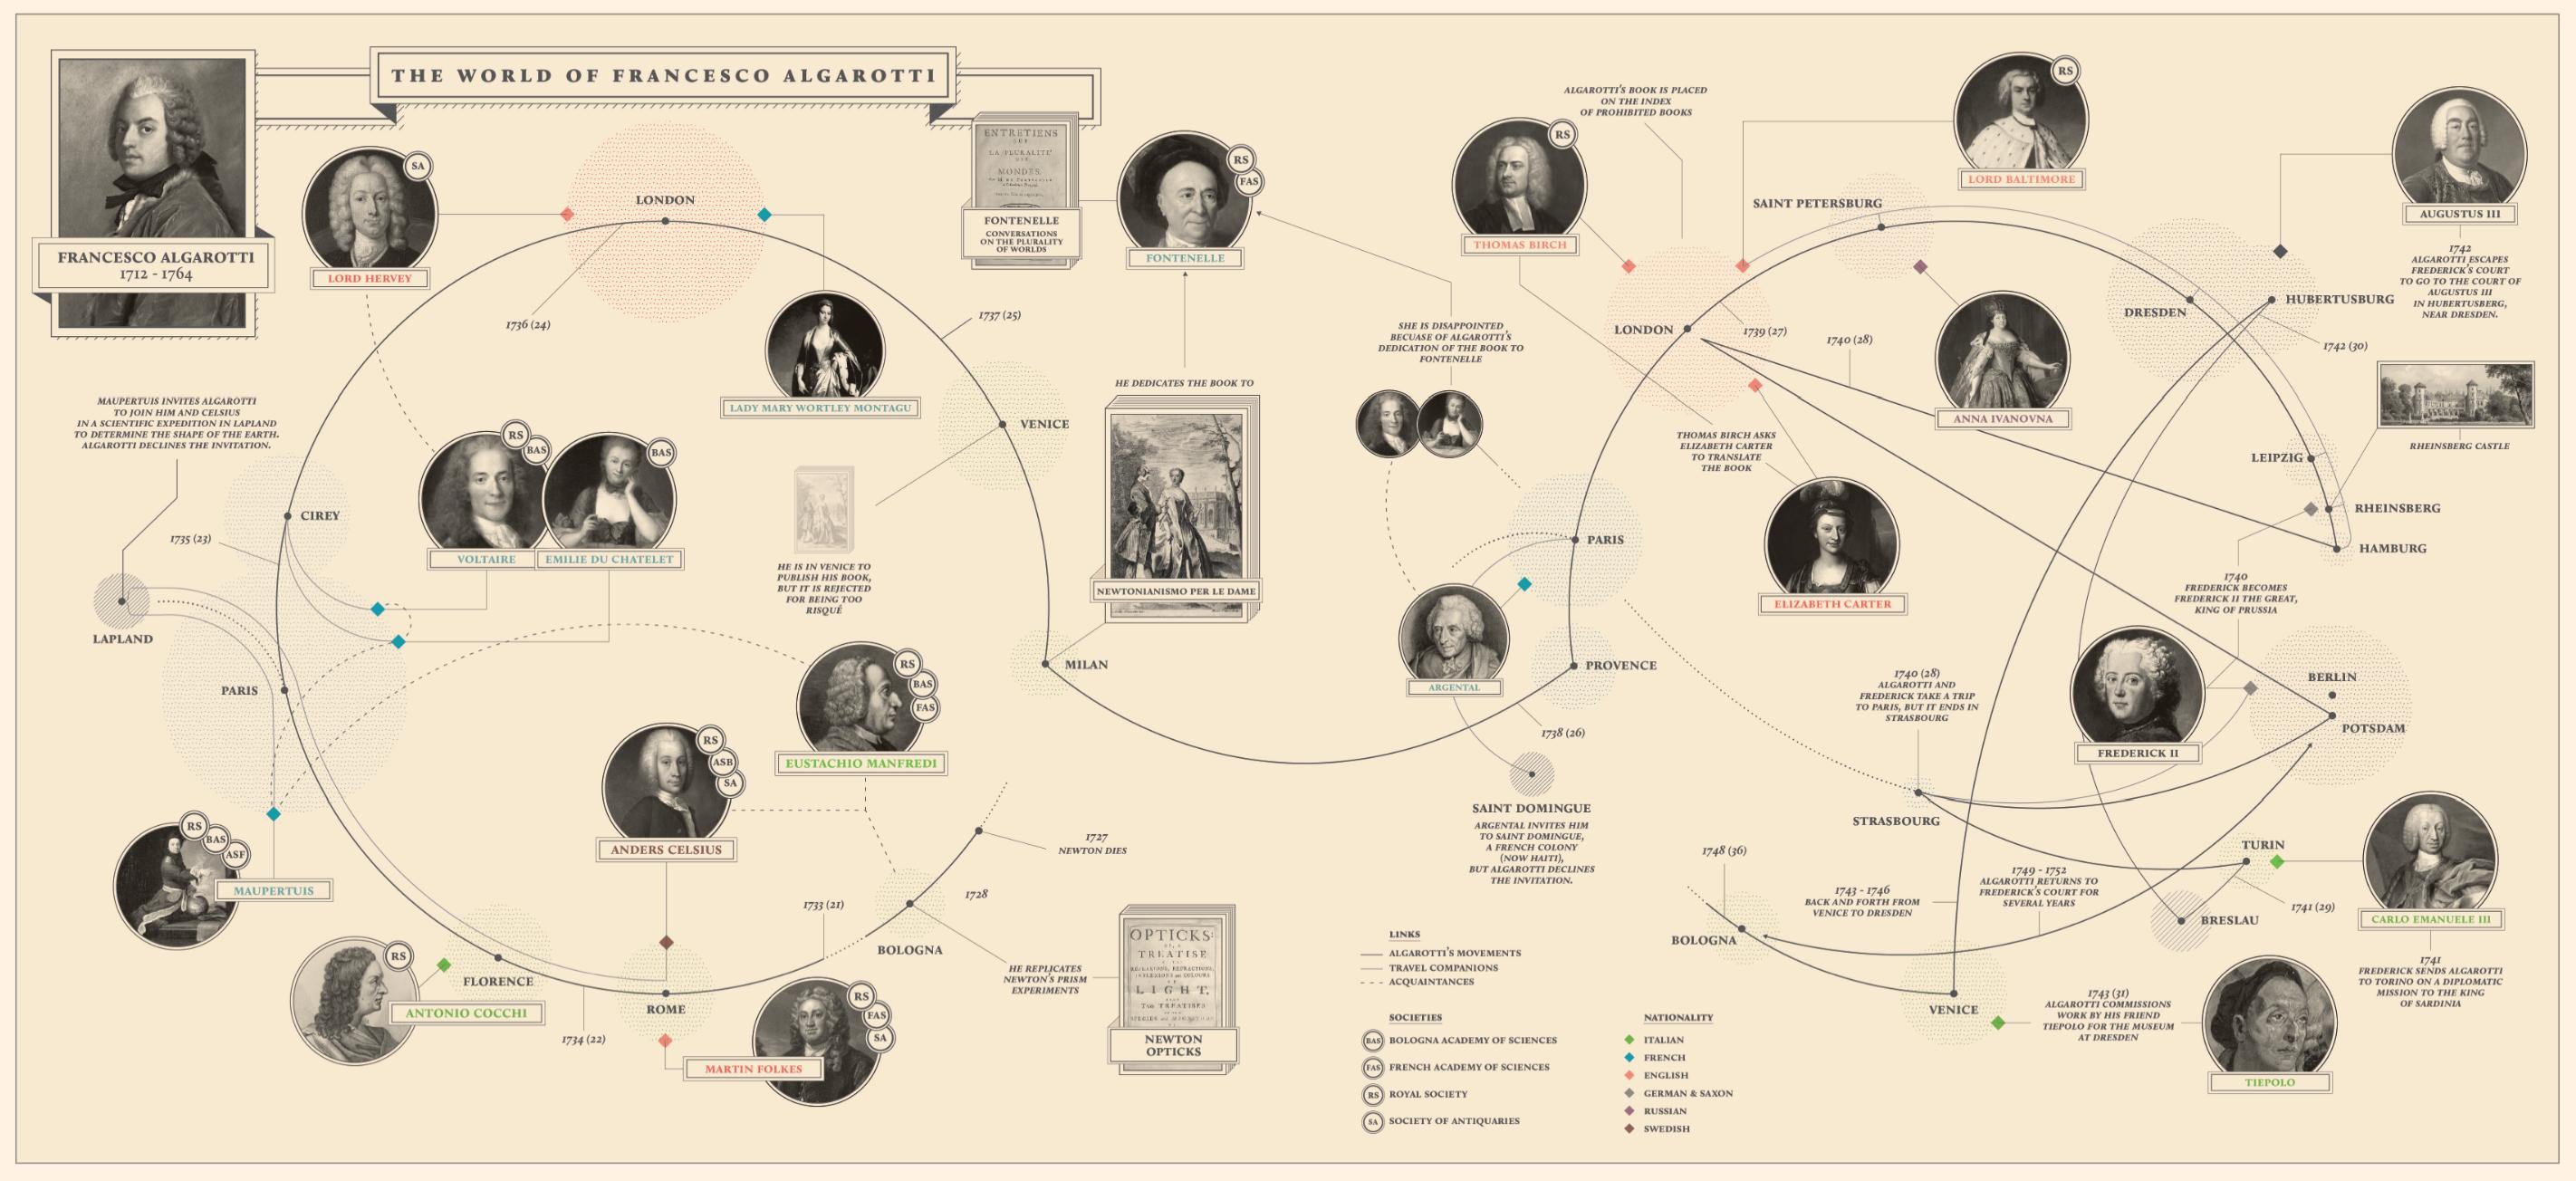 Visualization of Algarotti's World